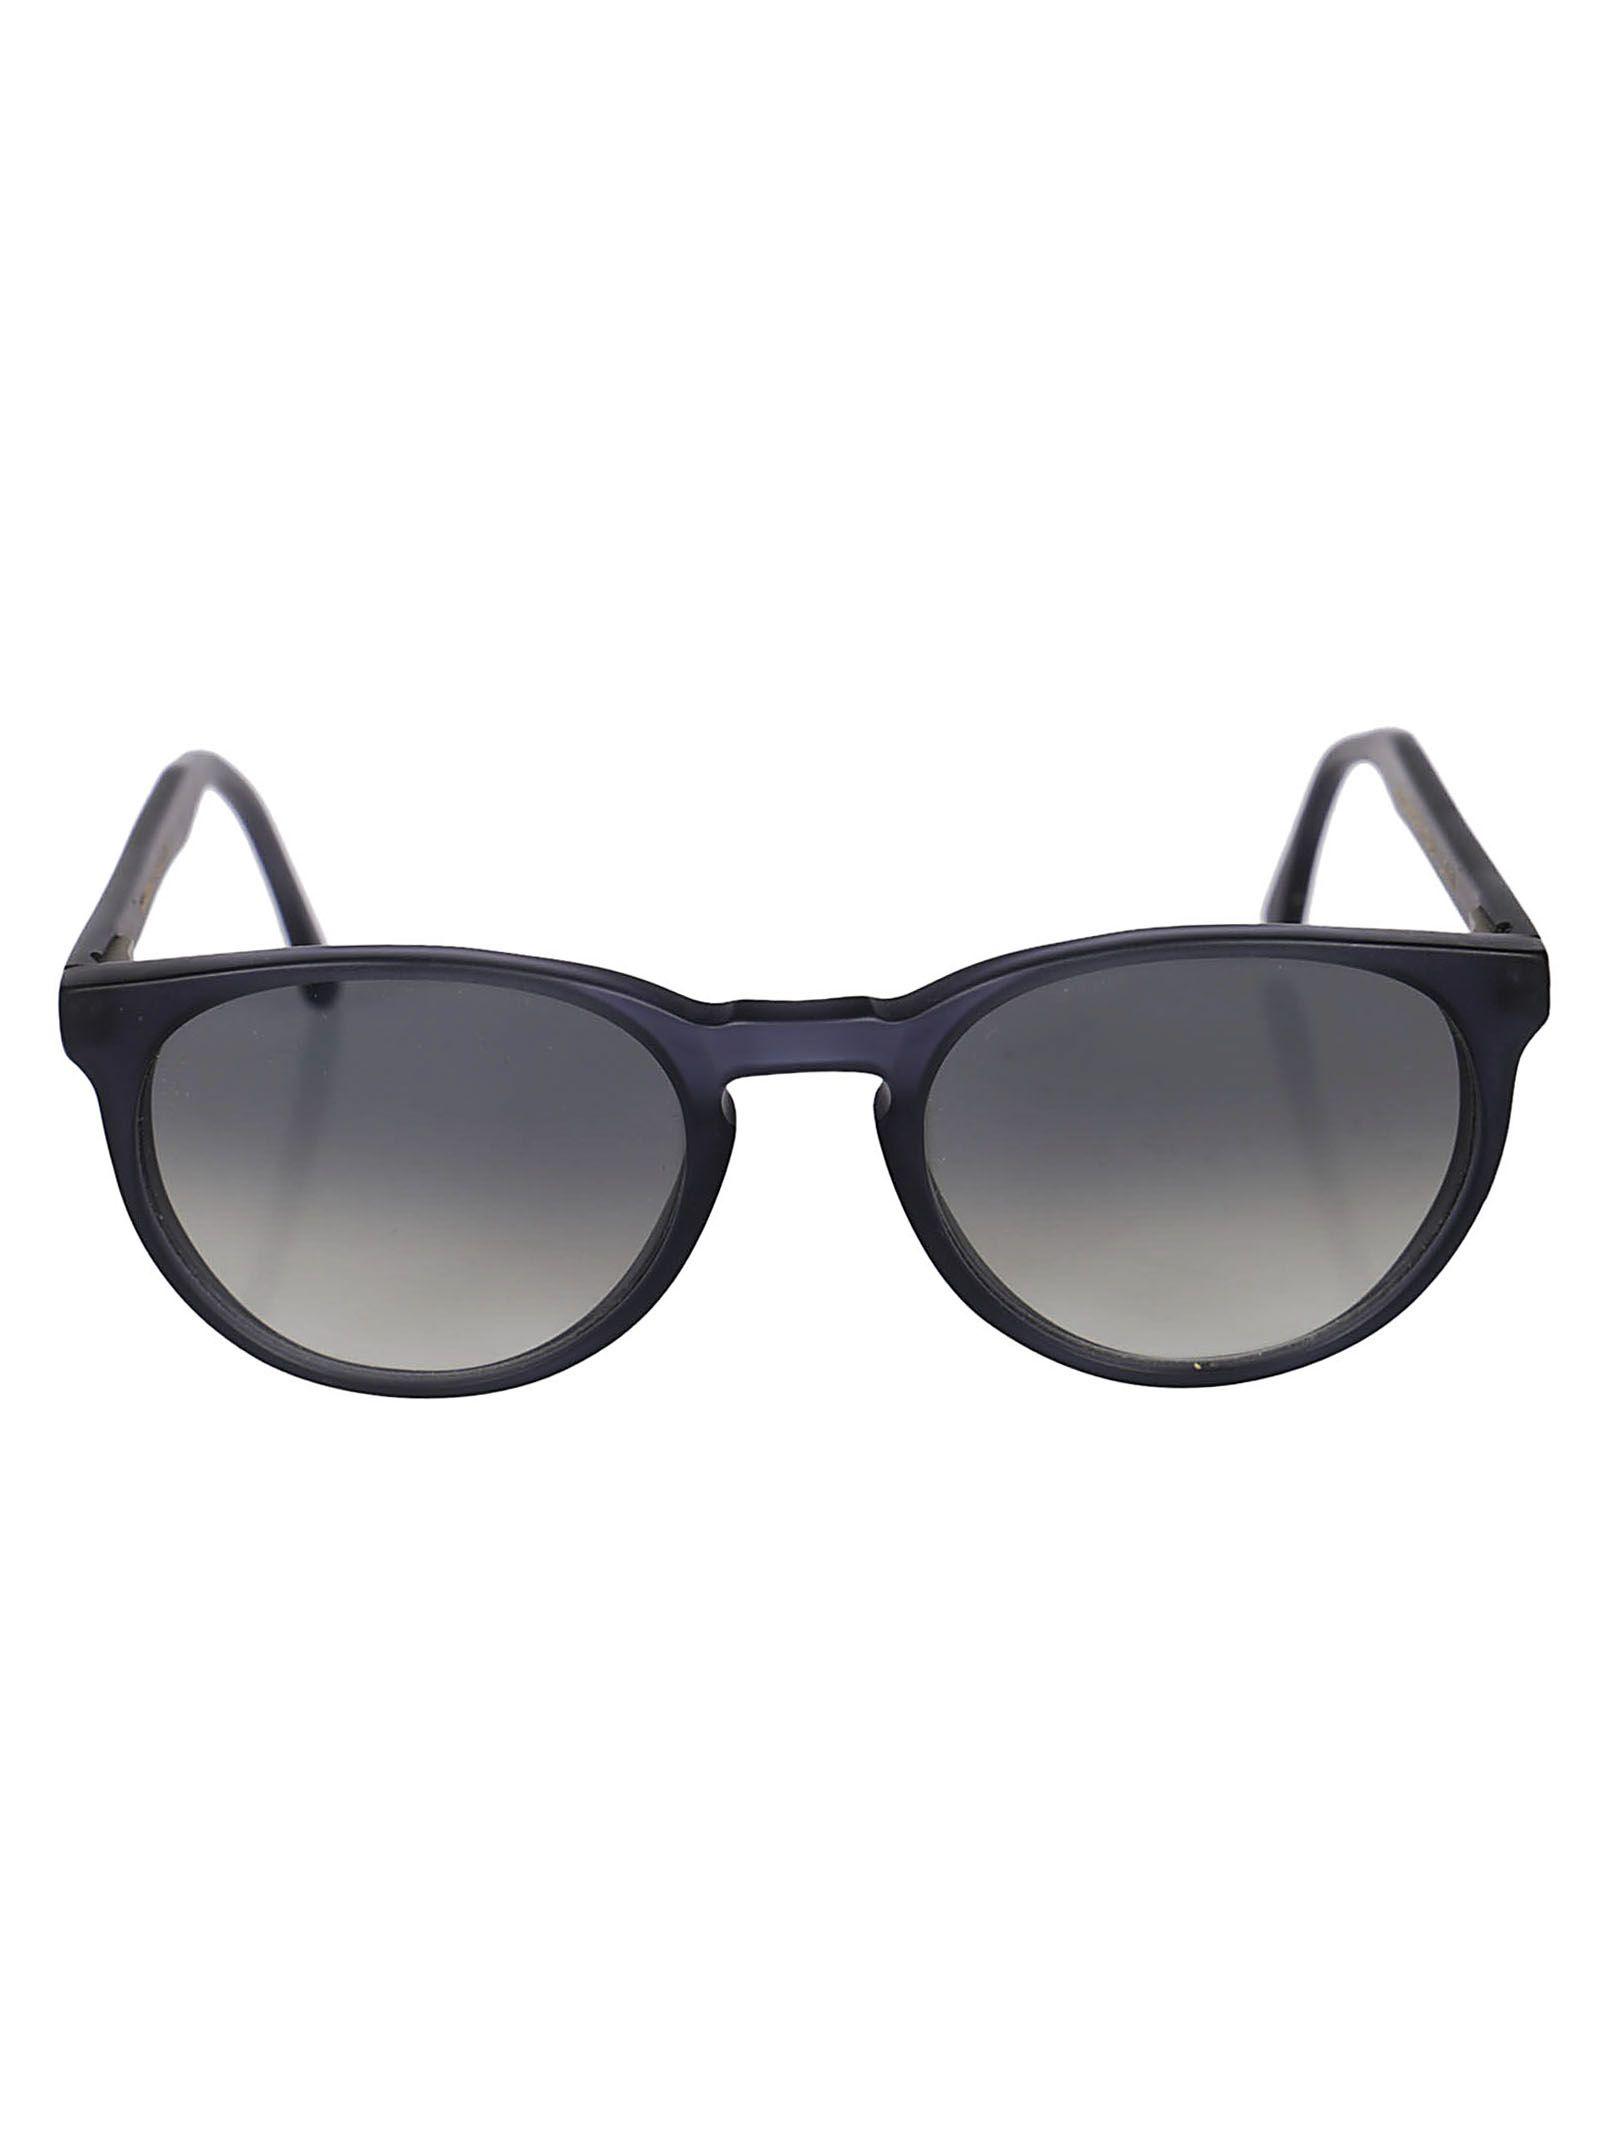 L.G.R Lgr Norton Sunglasses in Blue Navy